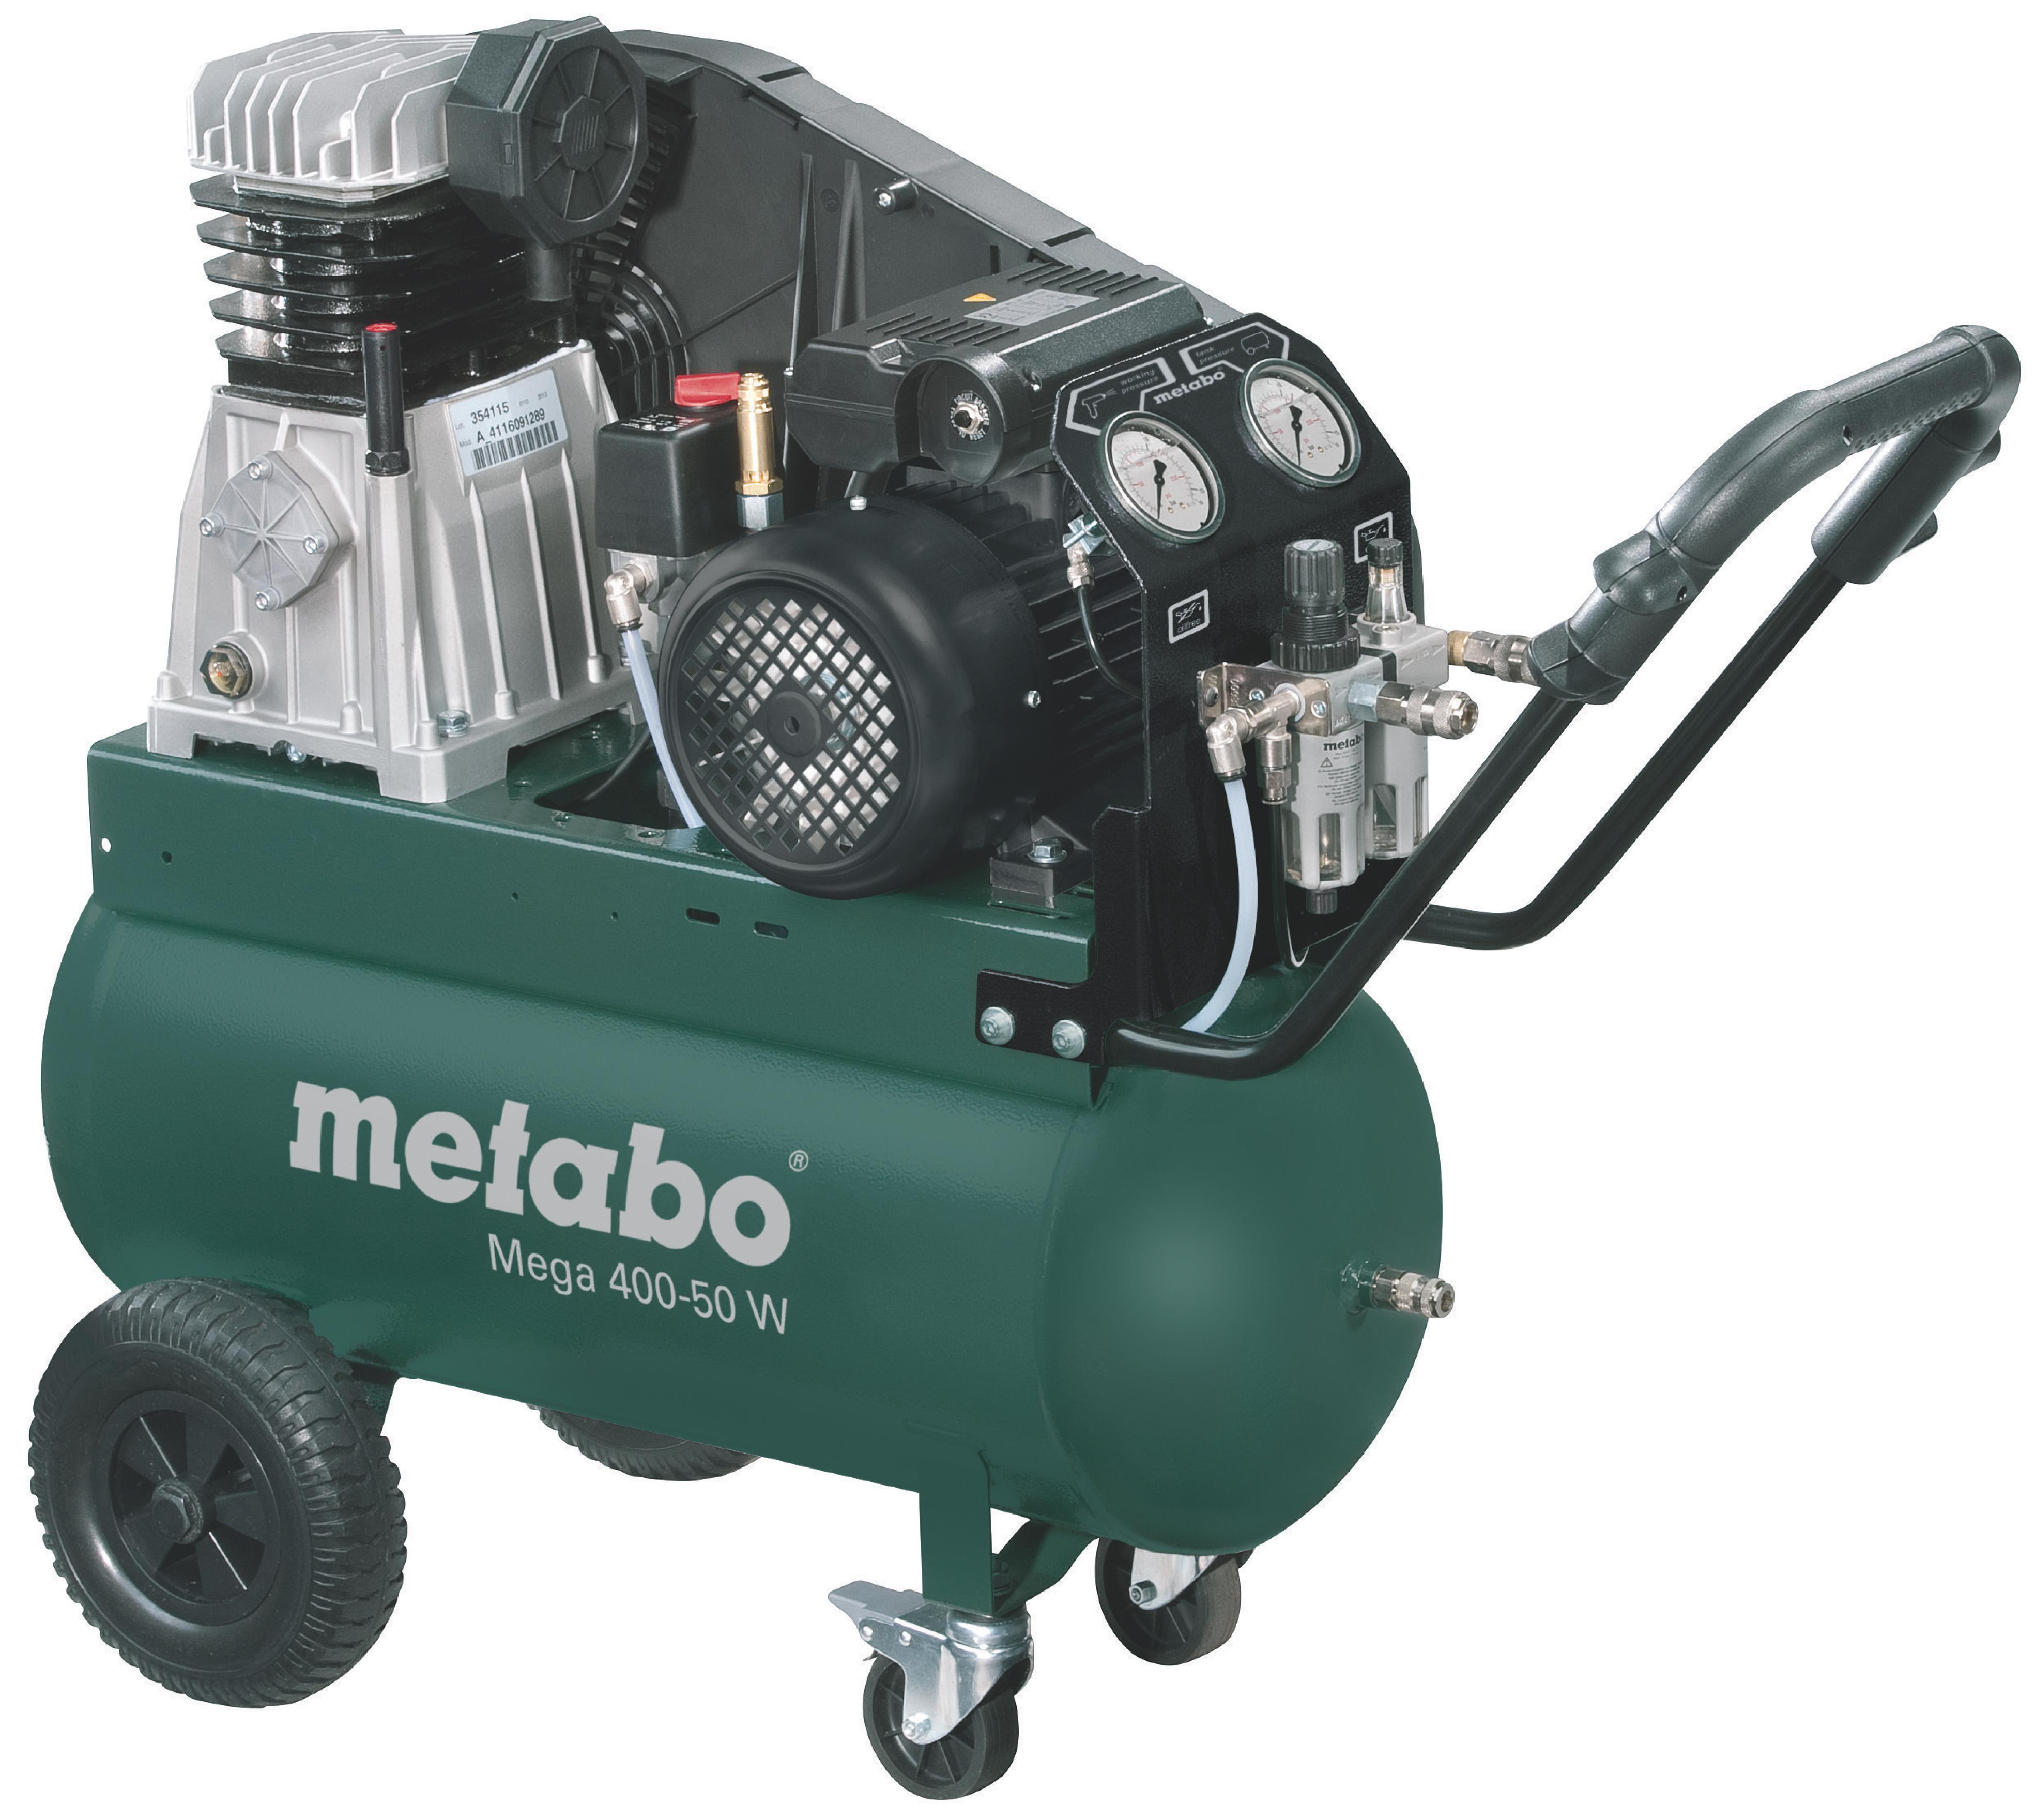 Metabo Mega 400-50 W kompresszor 50l, 2,2kW, 10bar